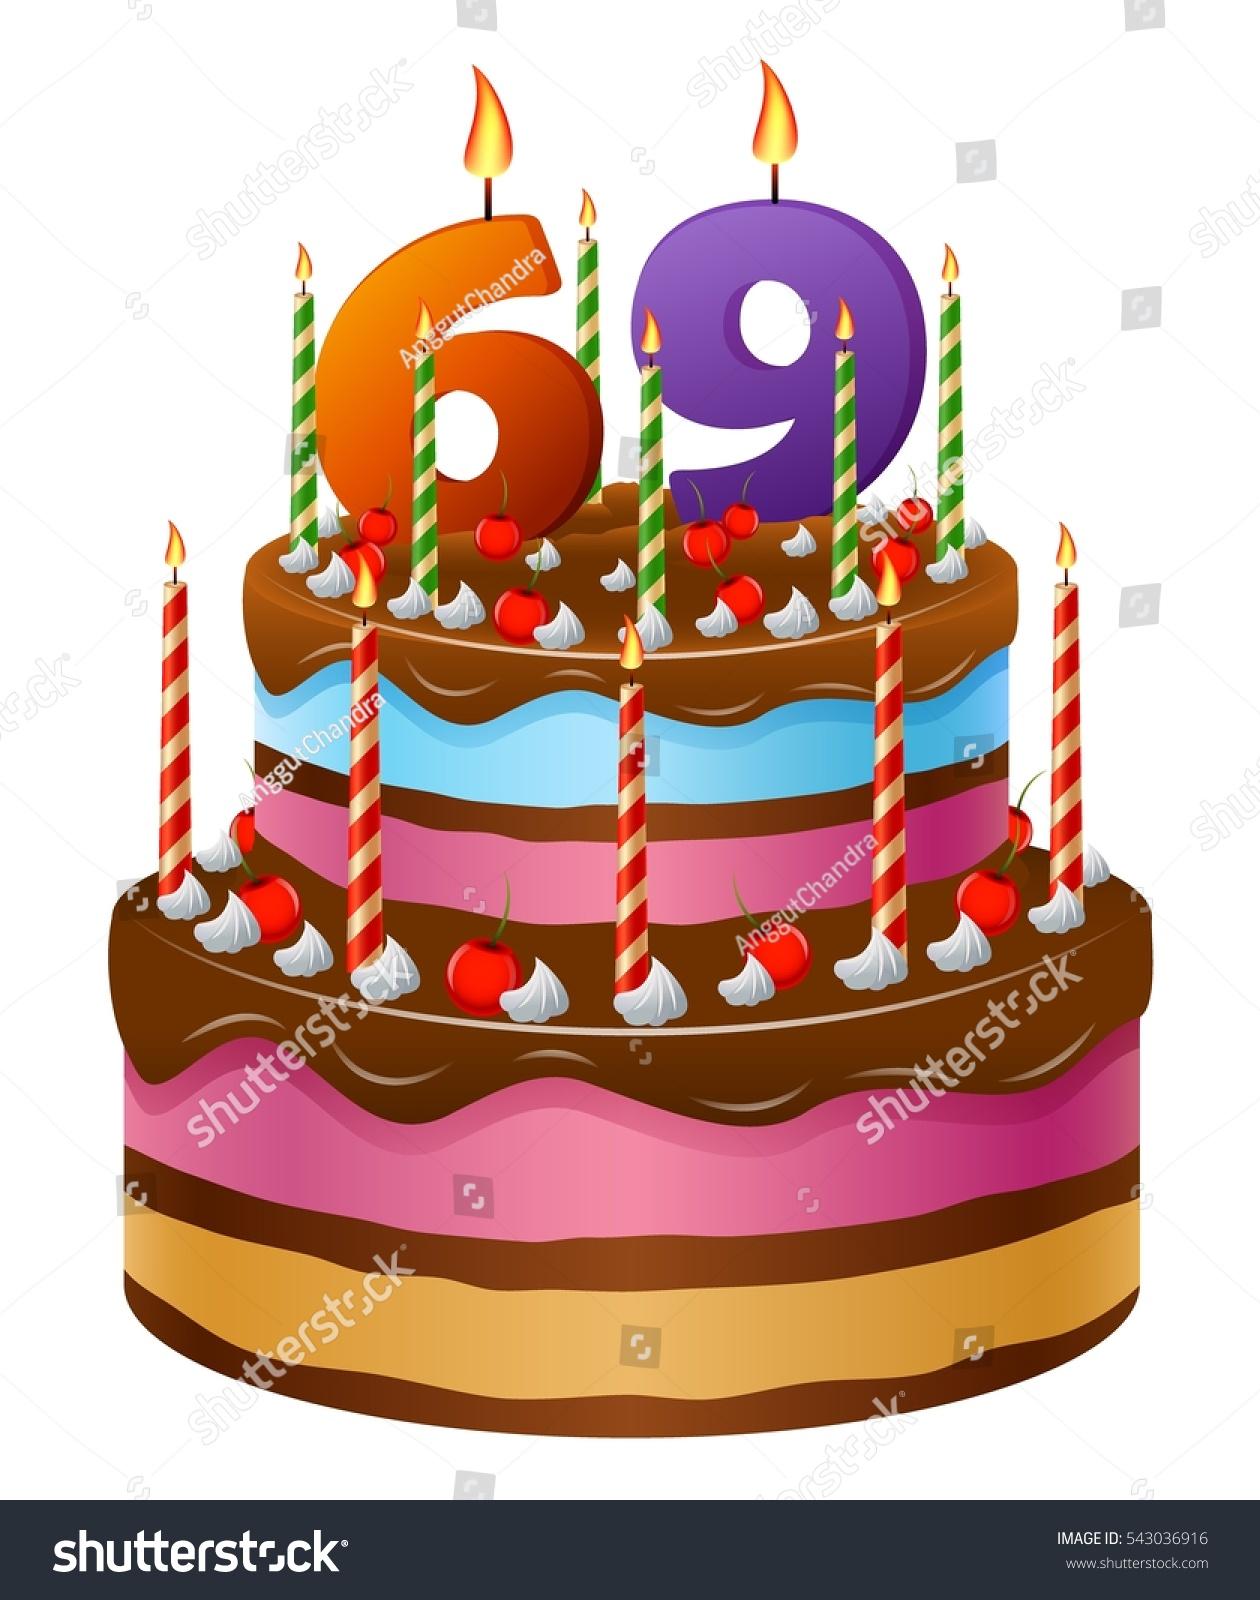 Happy Birthday Cake 69 Stock Illustration 543036916 Shutterstock